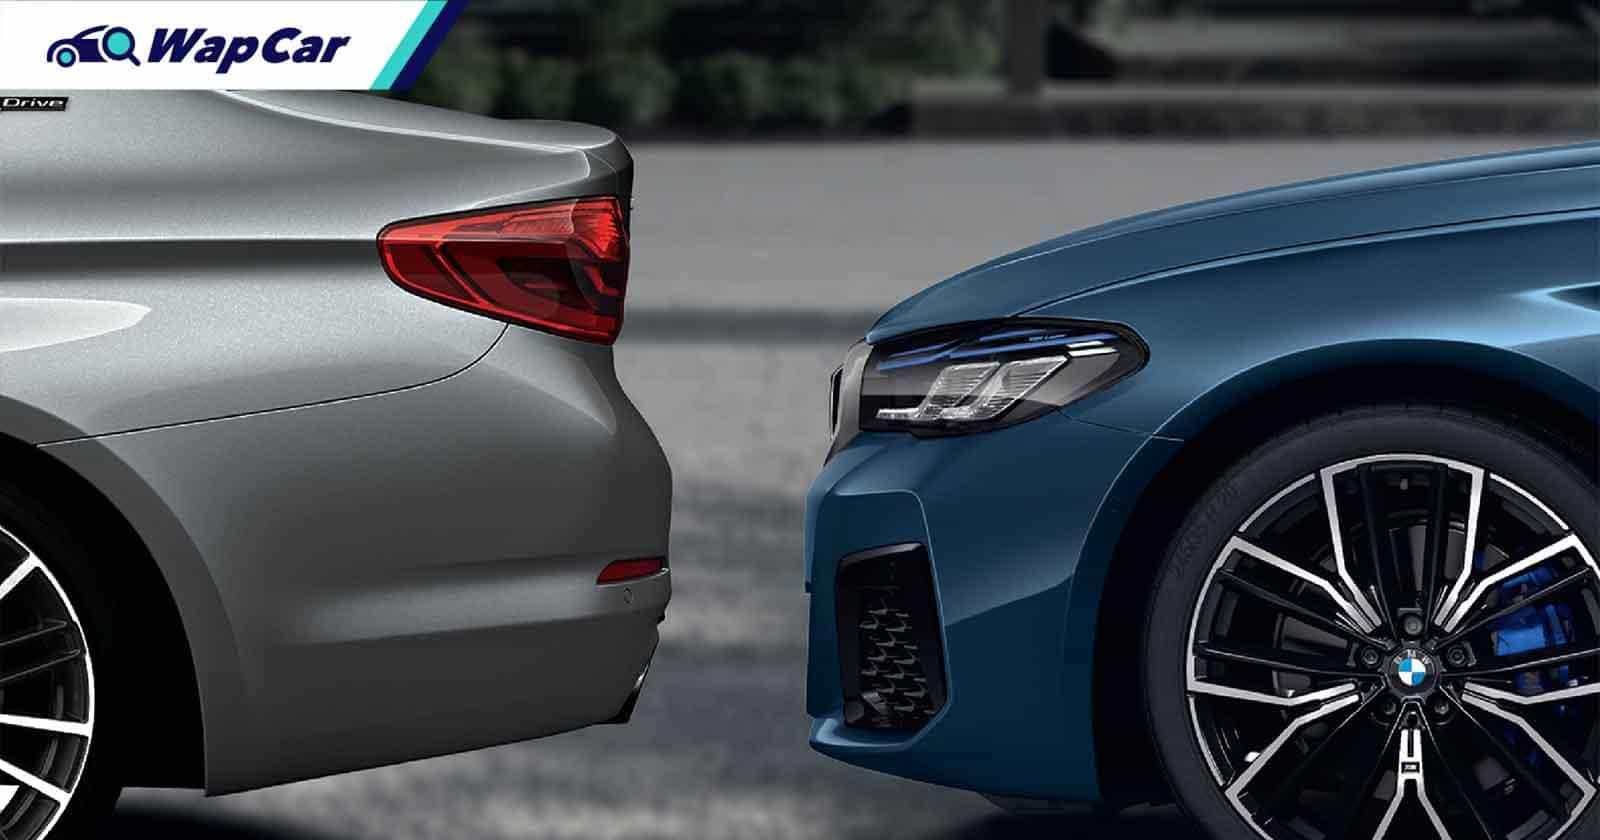 BMW 5 Series G30 facelift (LCI) 2021 diacah di Malaysia – varian 520i bakal digugurkan? 01